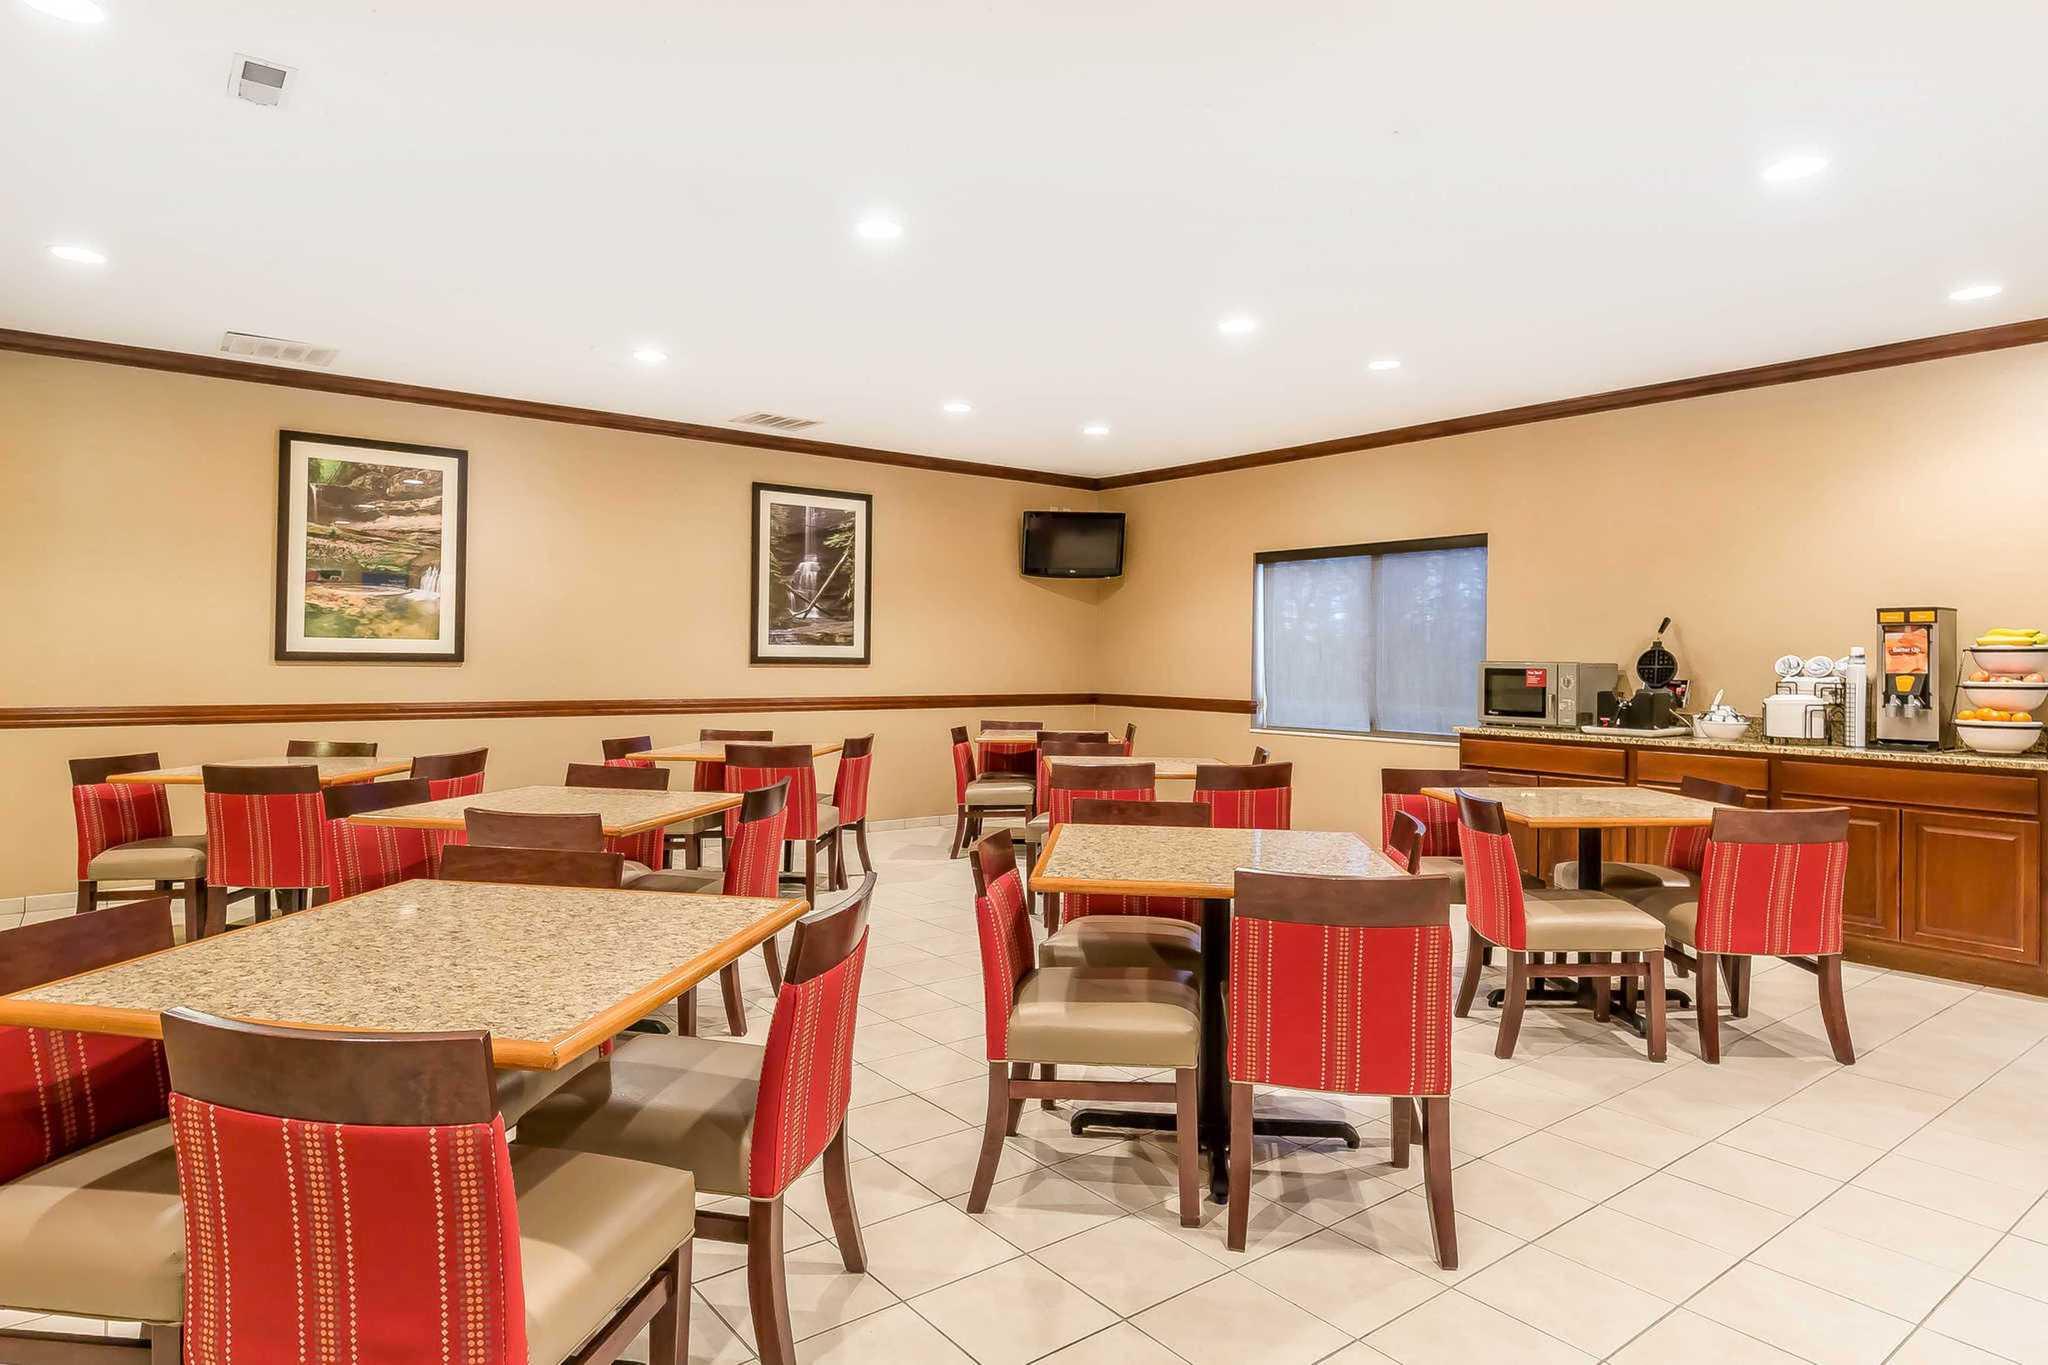 Comfort Inn & Suites image 31